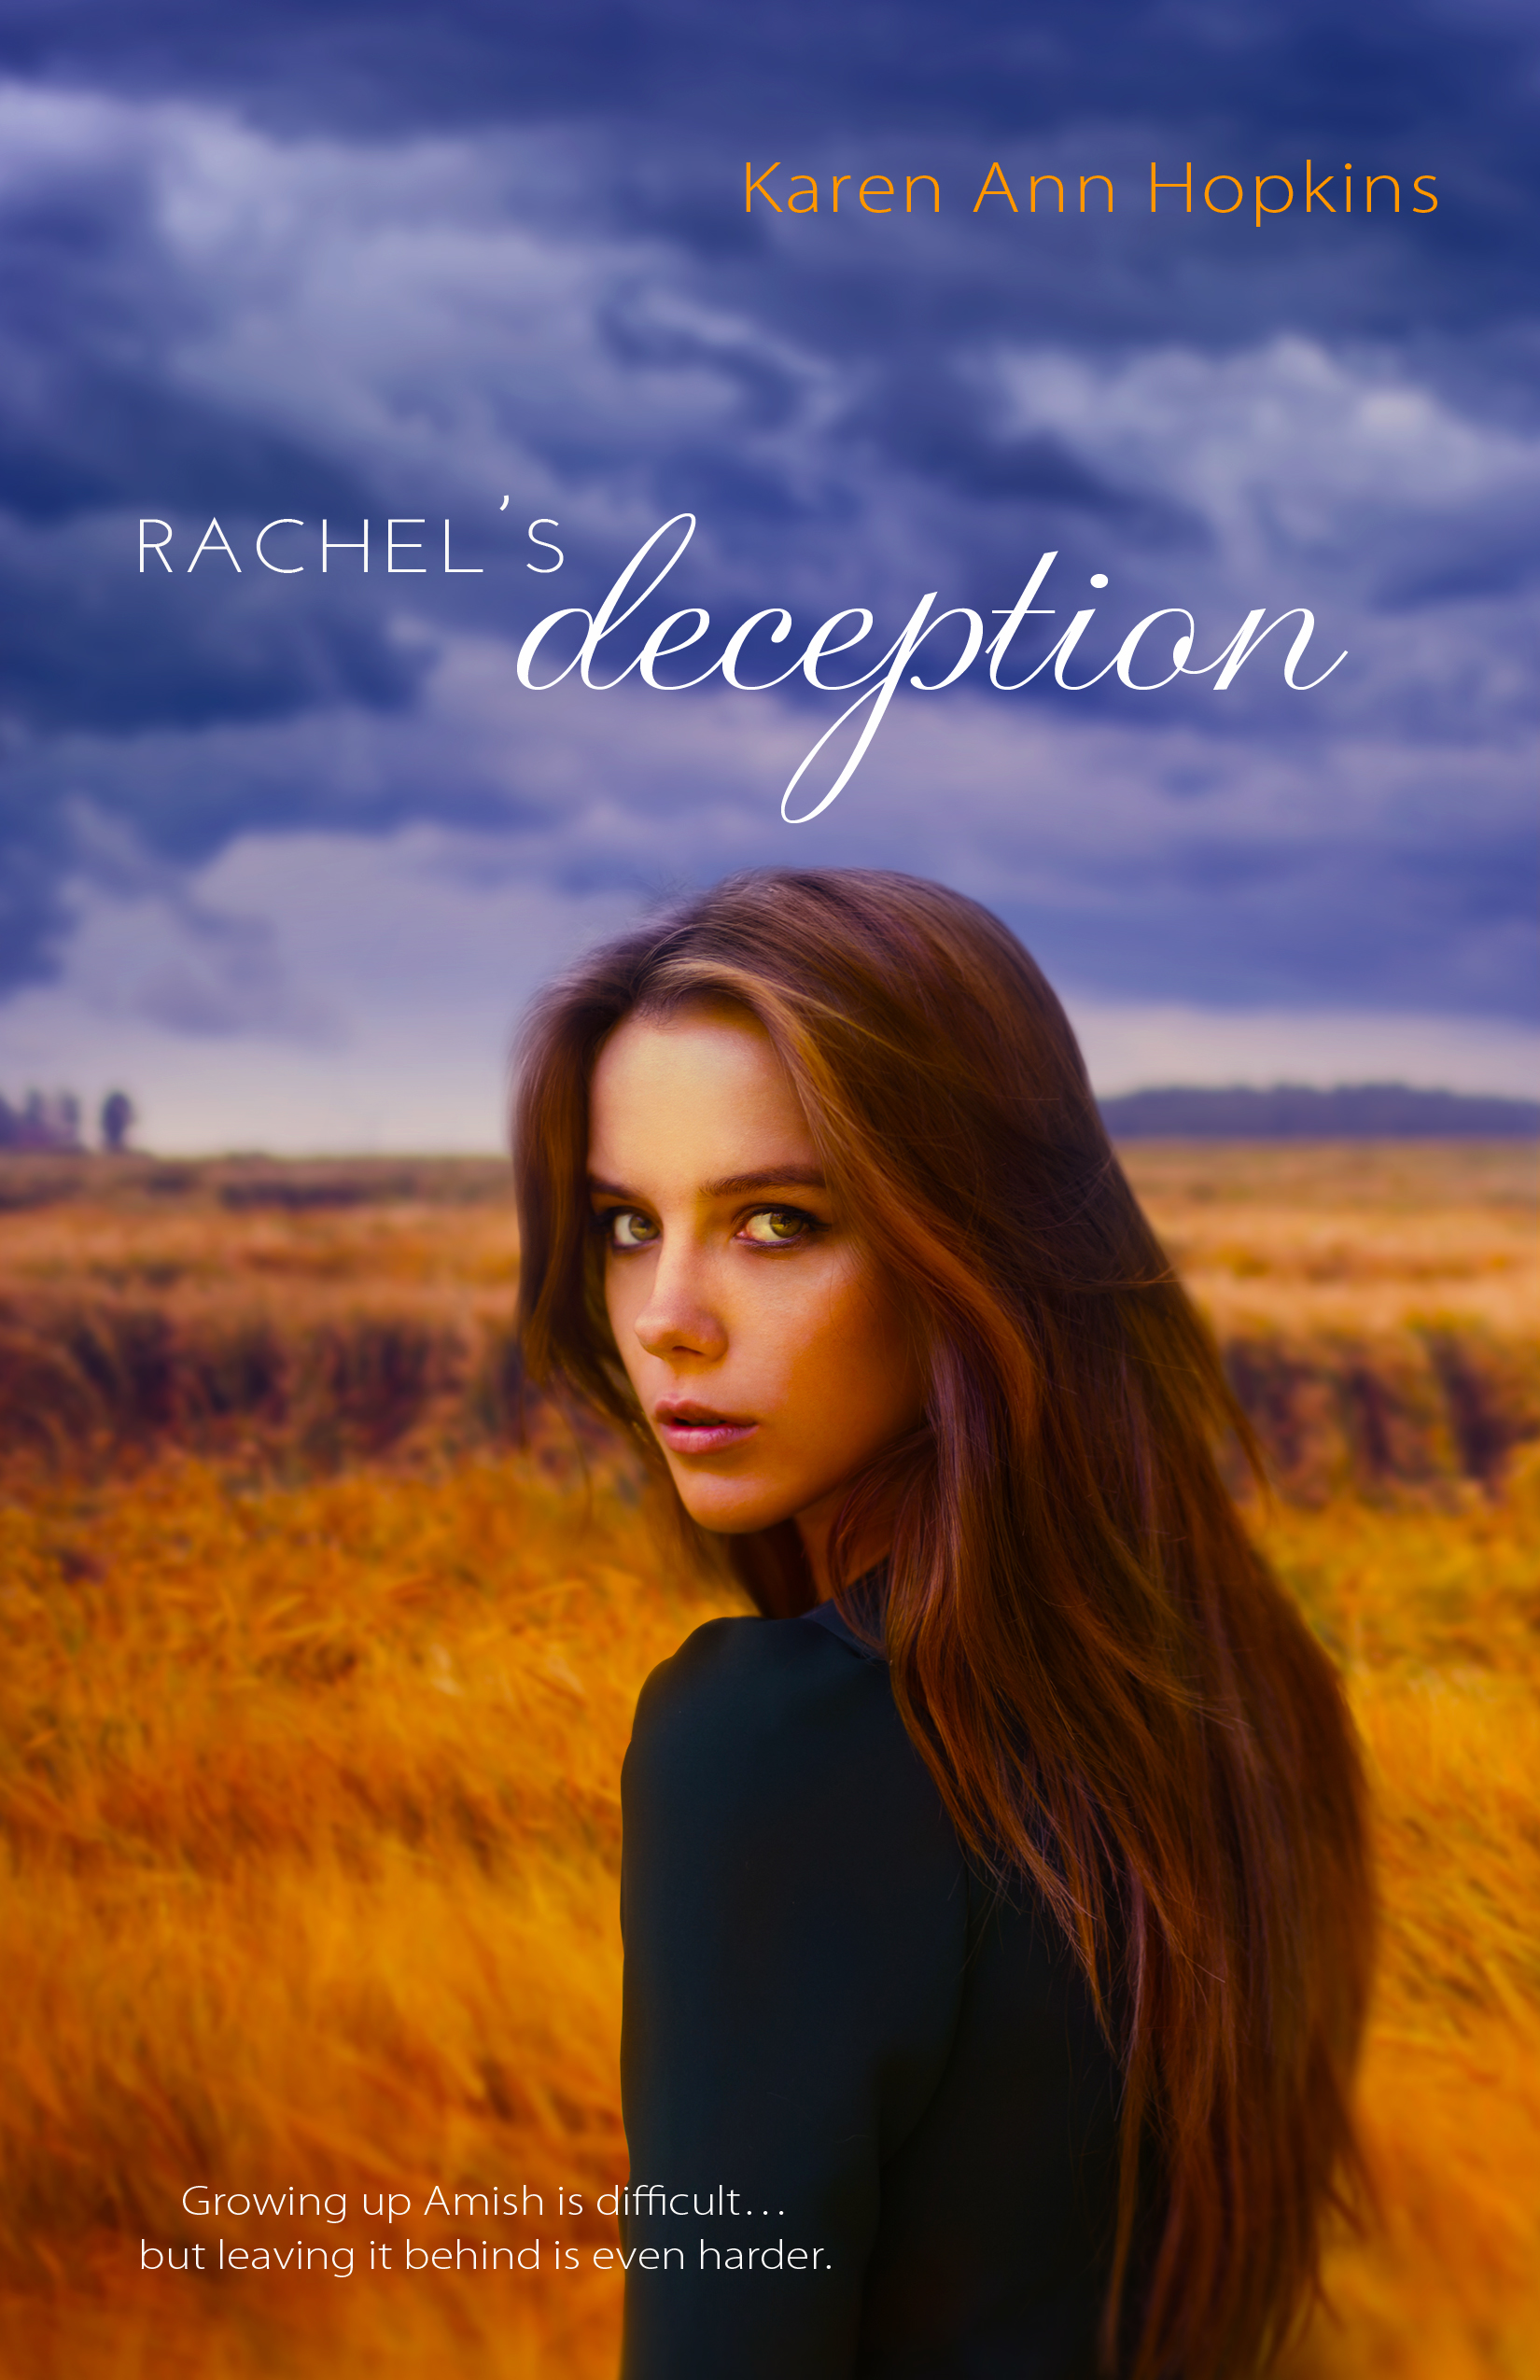 RachelsDeception.jpg Final.jpg